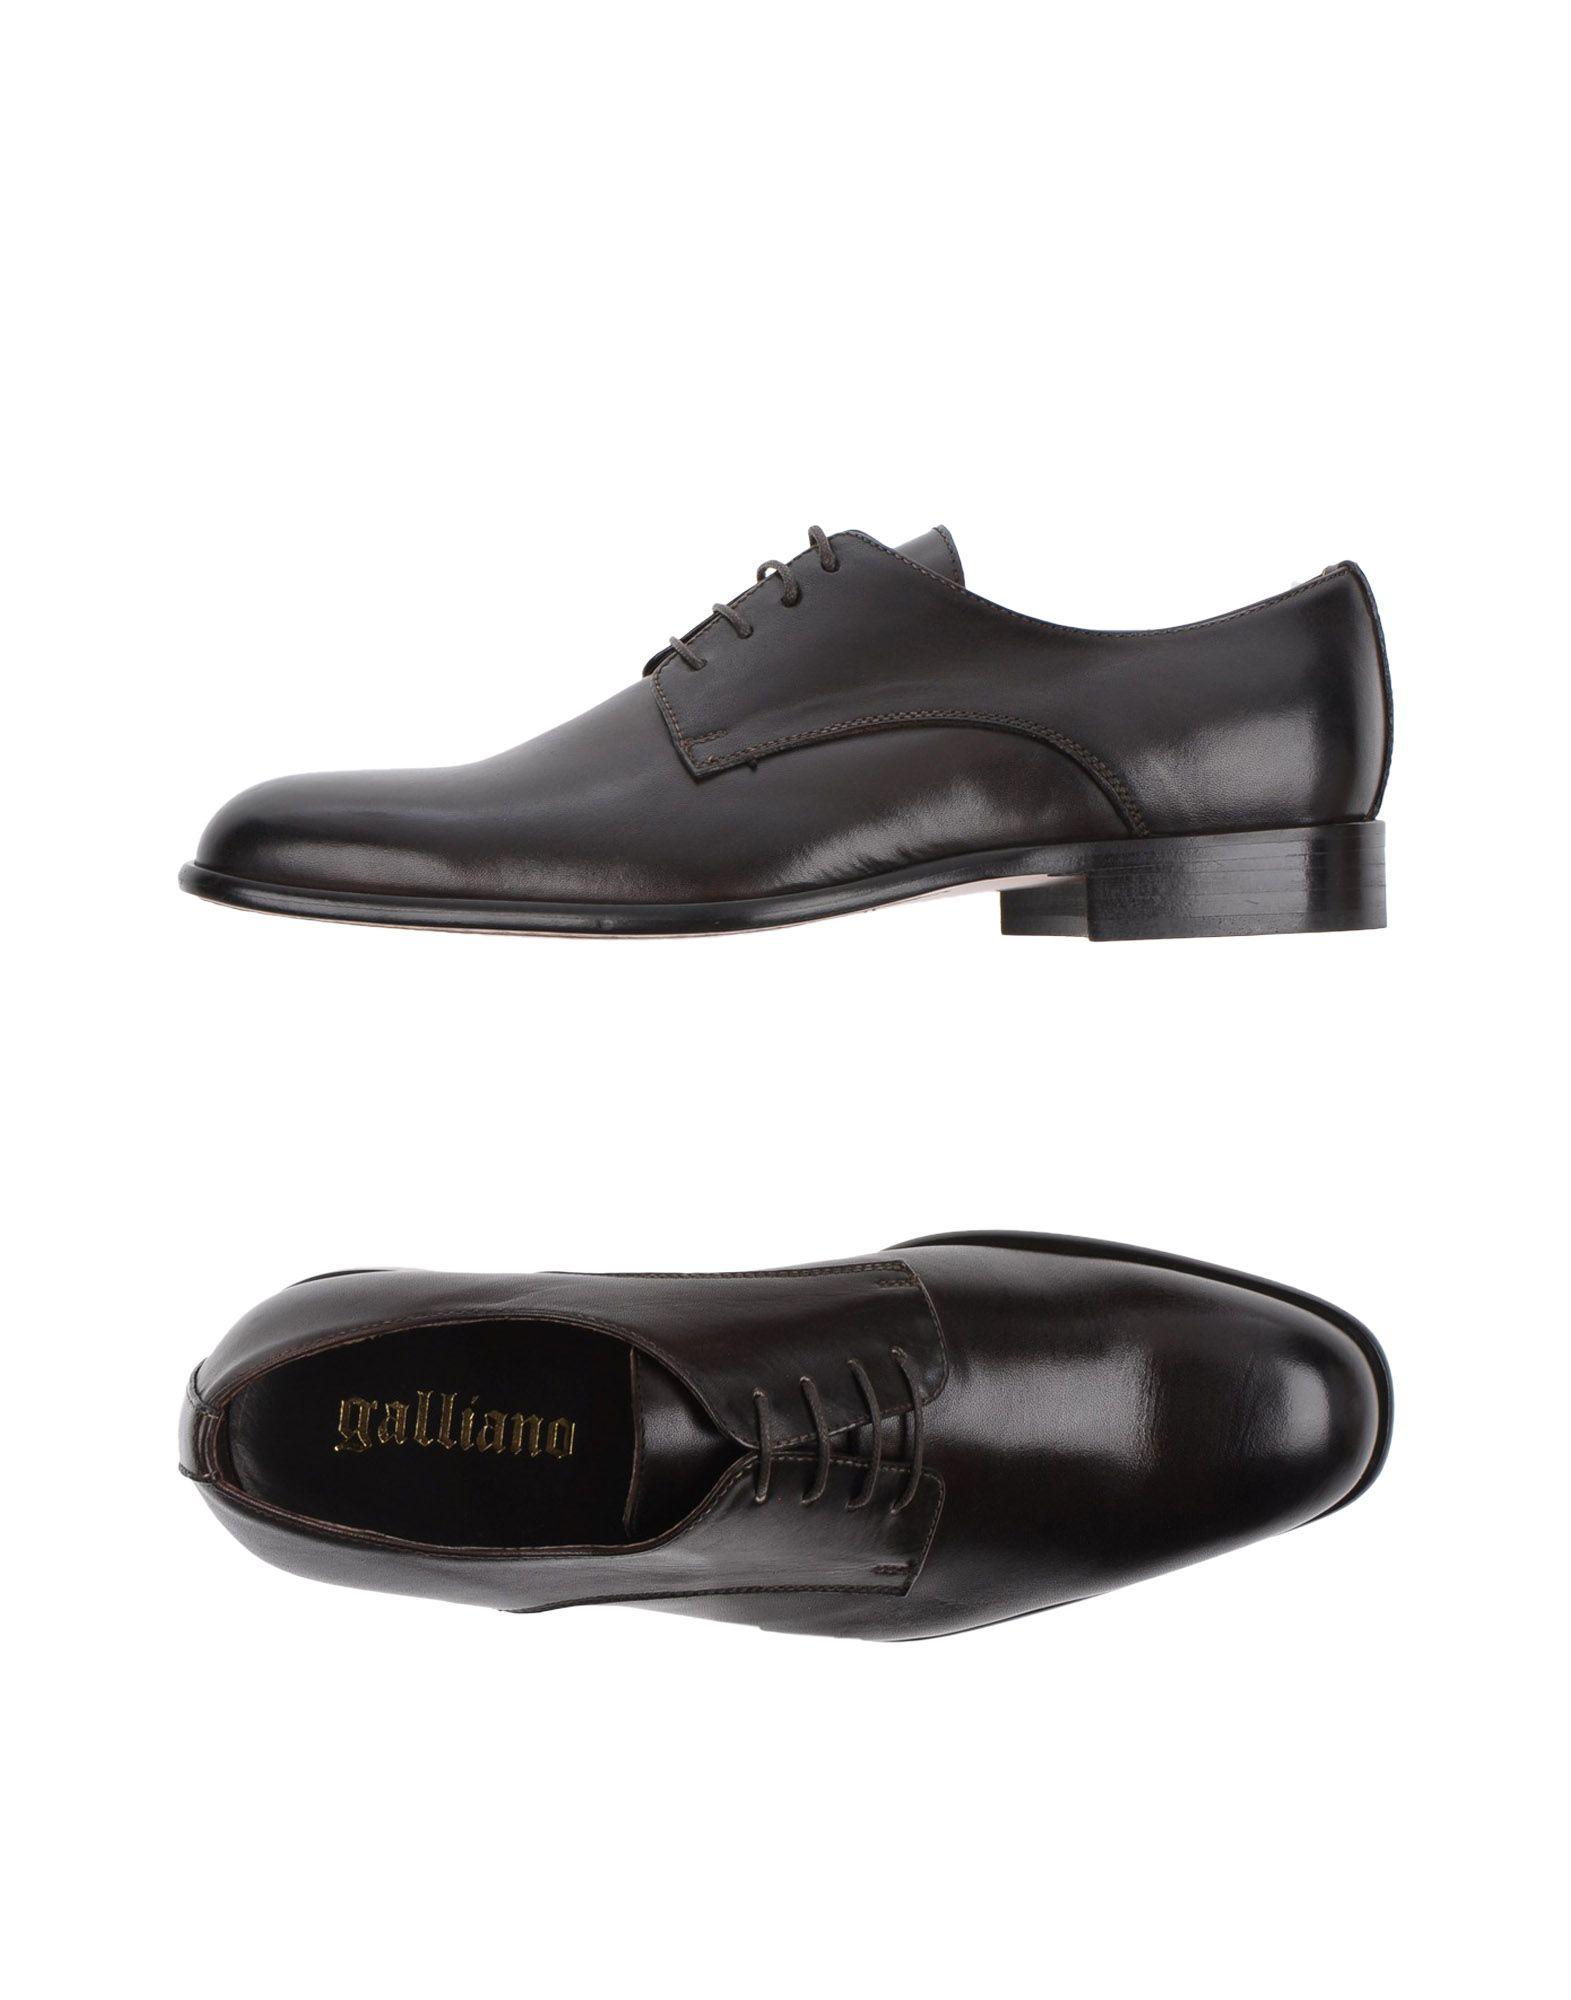 Haltbare Mode billige 11358223LE Schuhe Galliano Schnürschuhe Herren  11358223LE billige Heiße Schuhe 53cc63